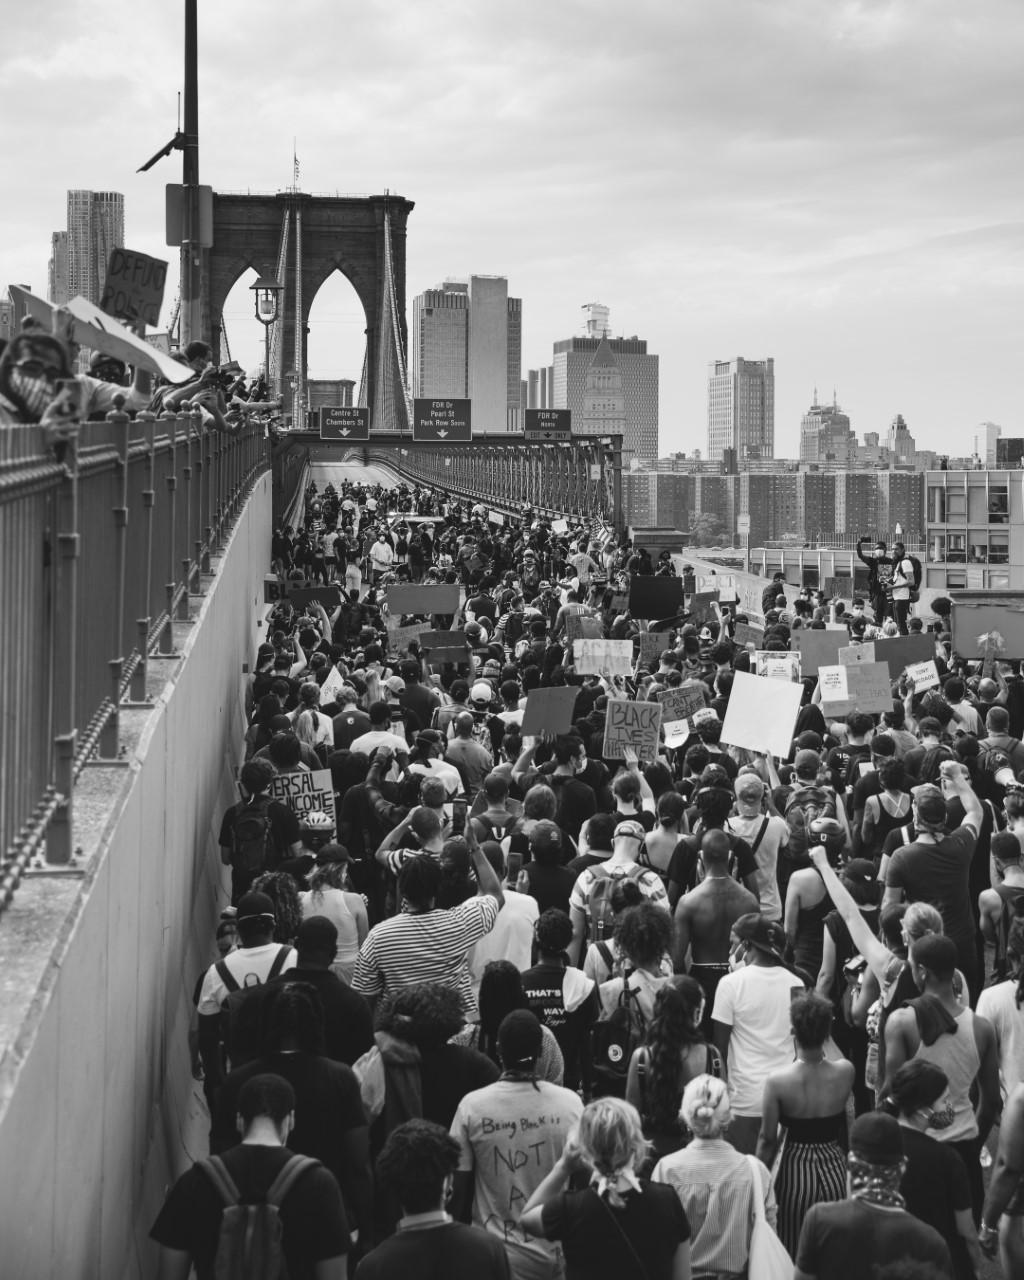 Black and white photo of protestors walking across the Brooklyn Bridge